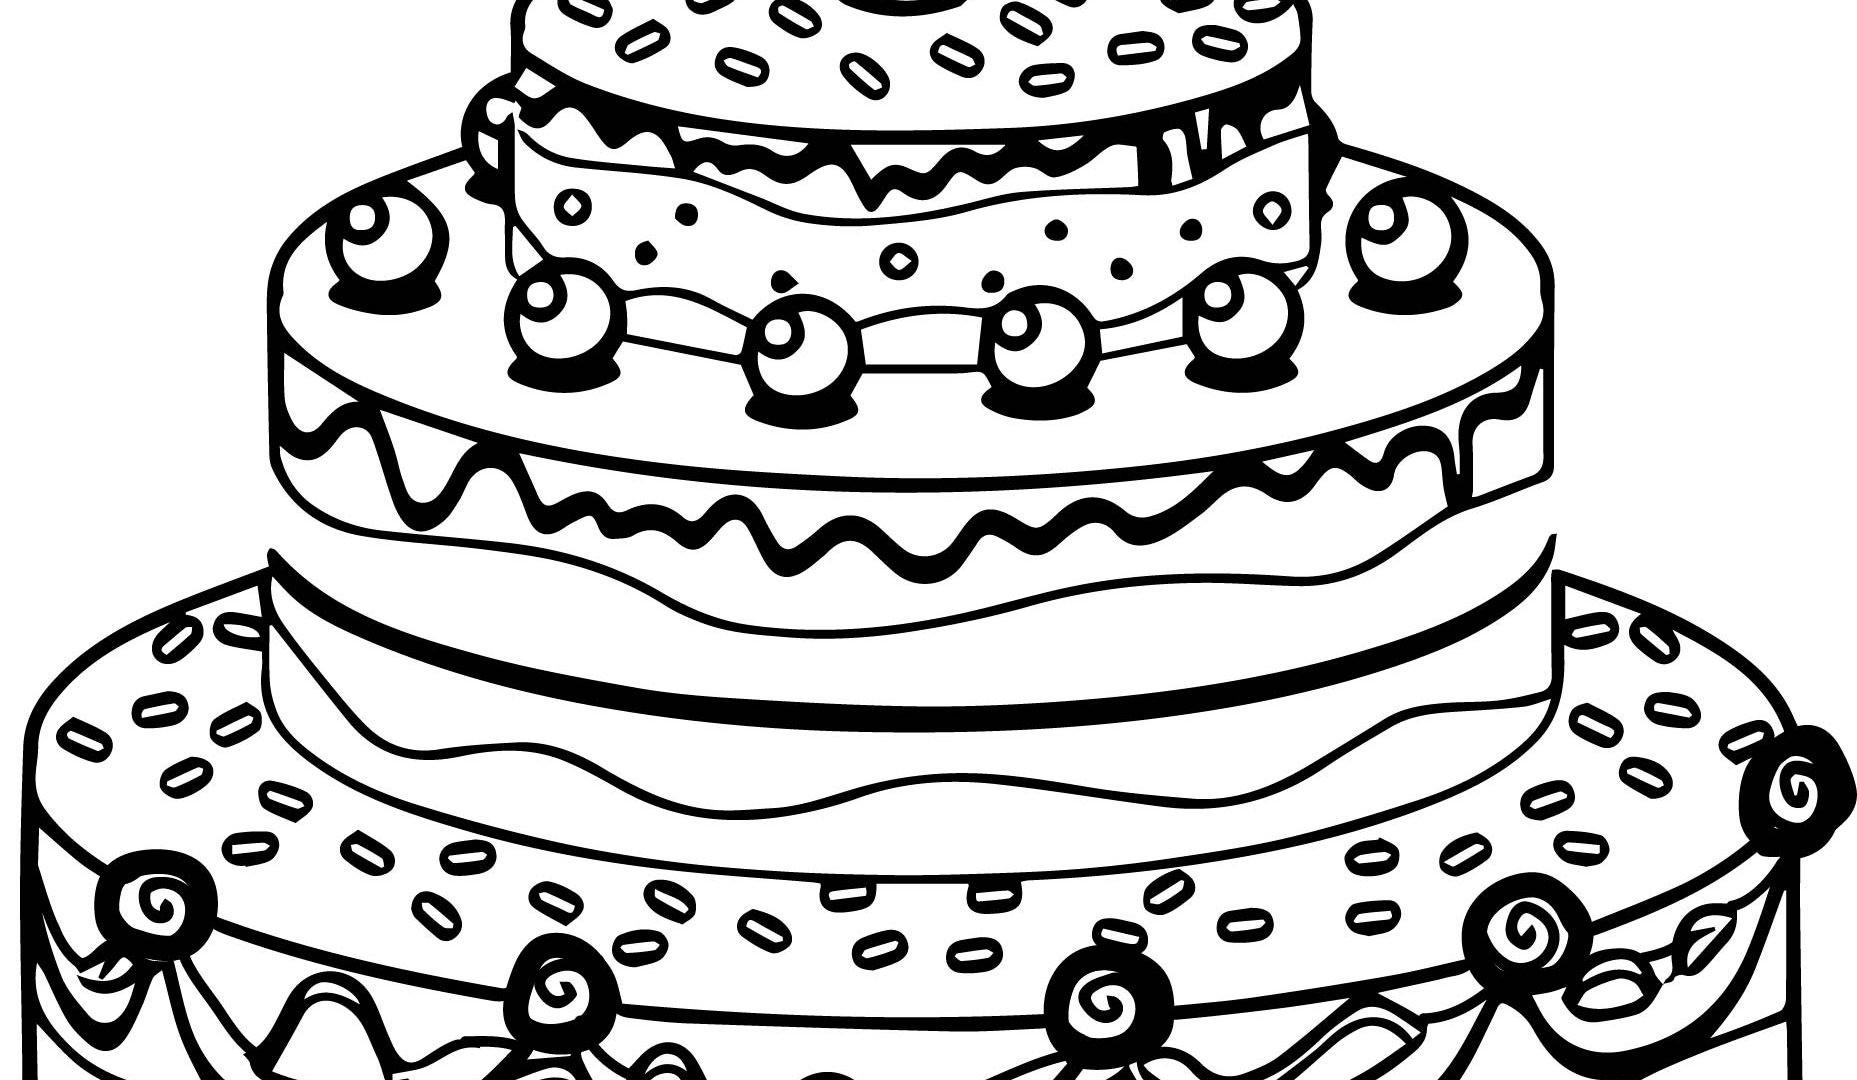 Simple Birthday Cake Drawing at GetDrawings | Free download